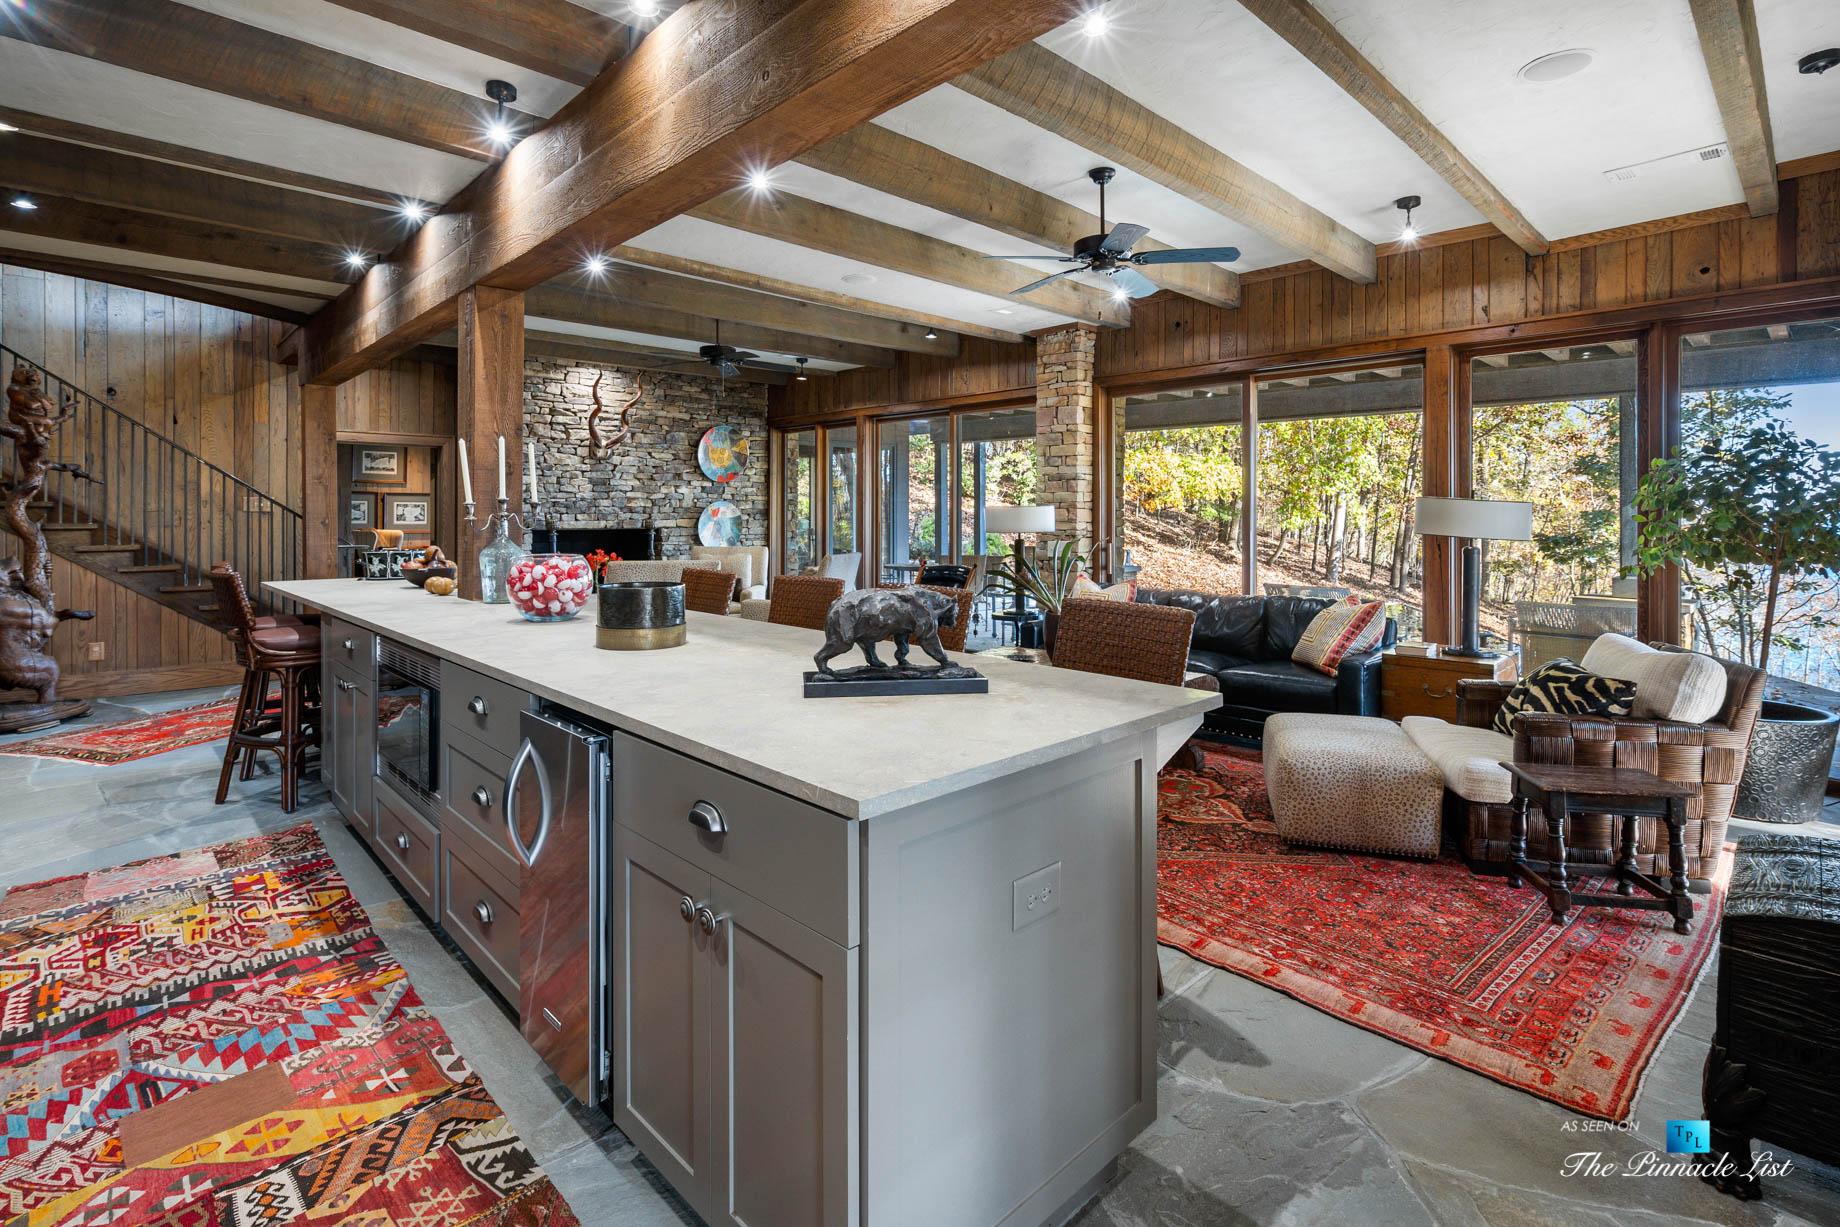 7860 Chestnut Hill Rd, Cumming, GA, USA – Recreation Room and Bar – Luxury Real Estate – Lake Lanier Mid-Century Modern Stone Home